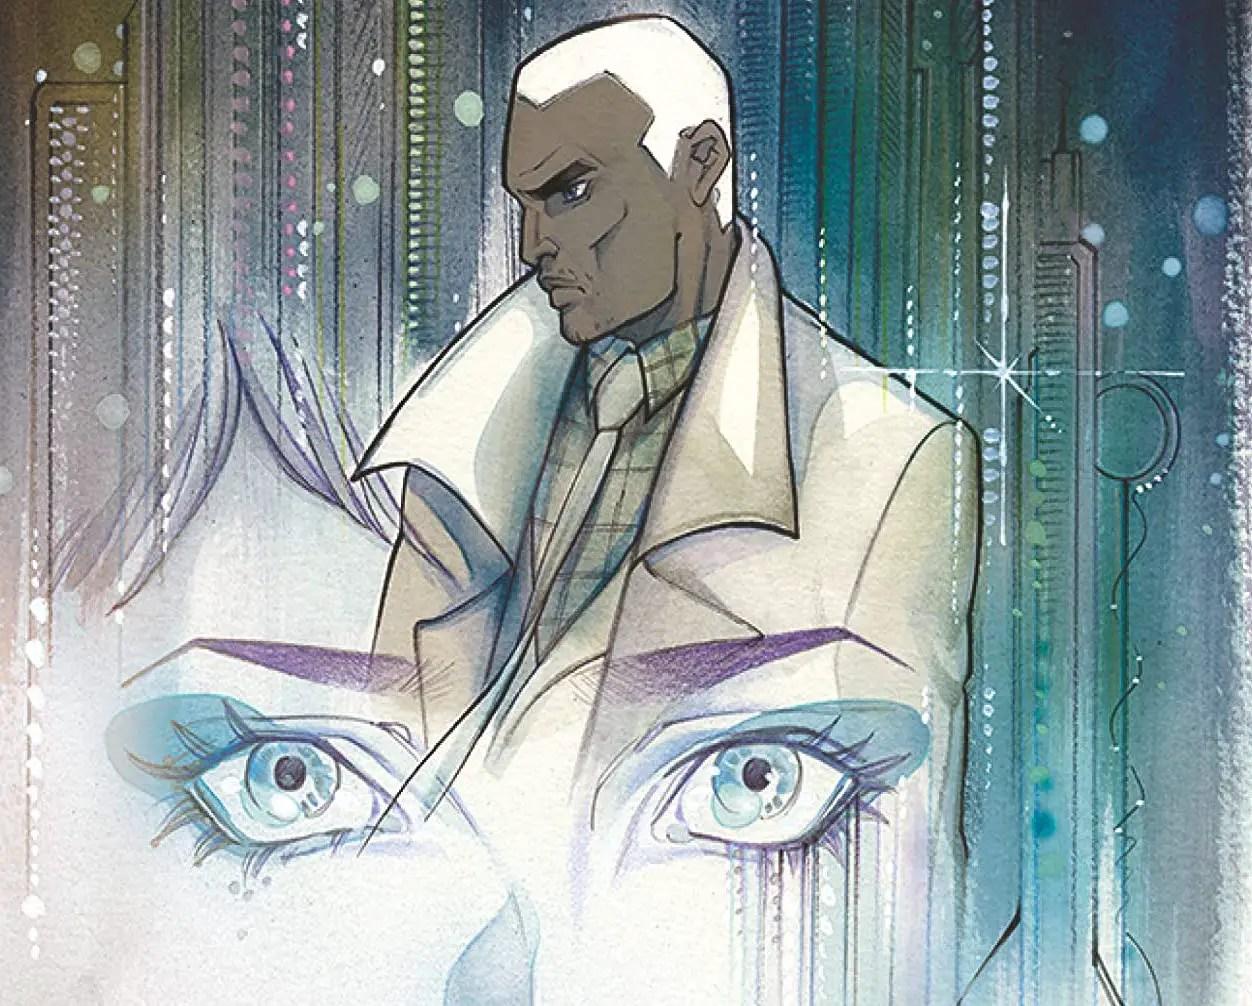 Blade Runner: Origins #1